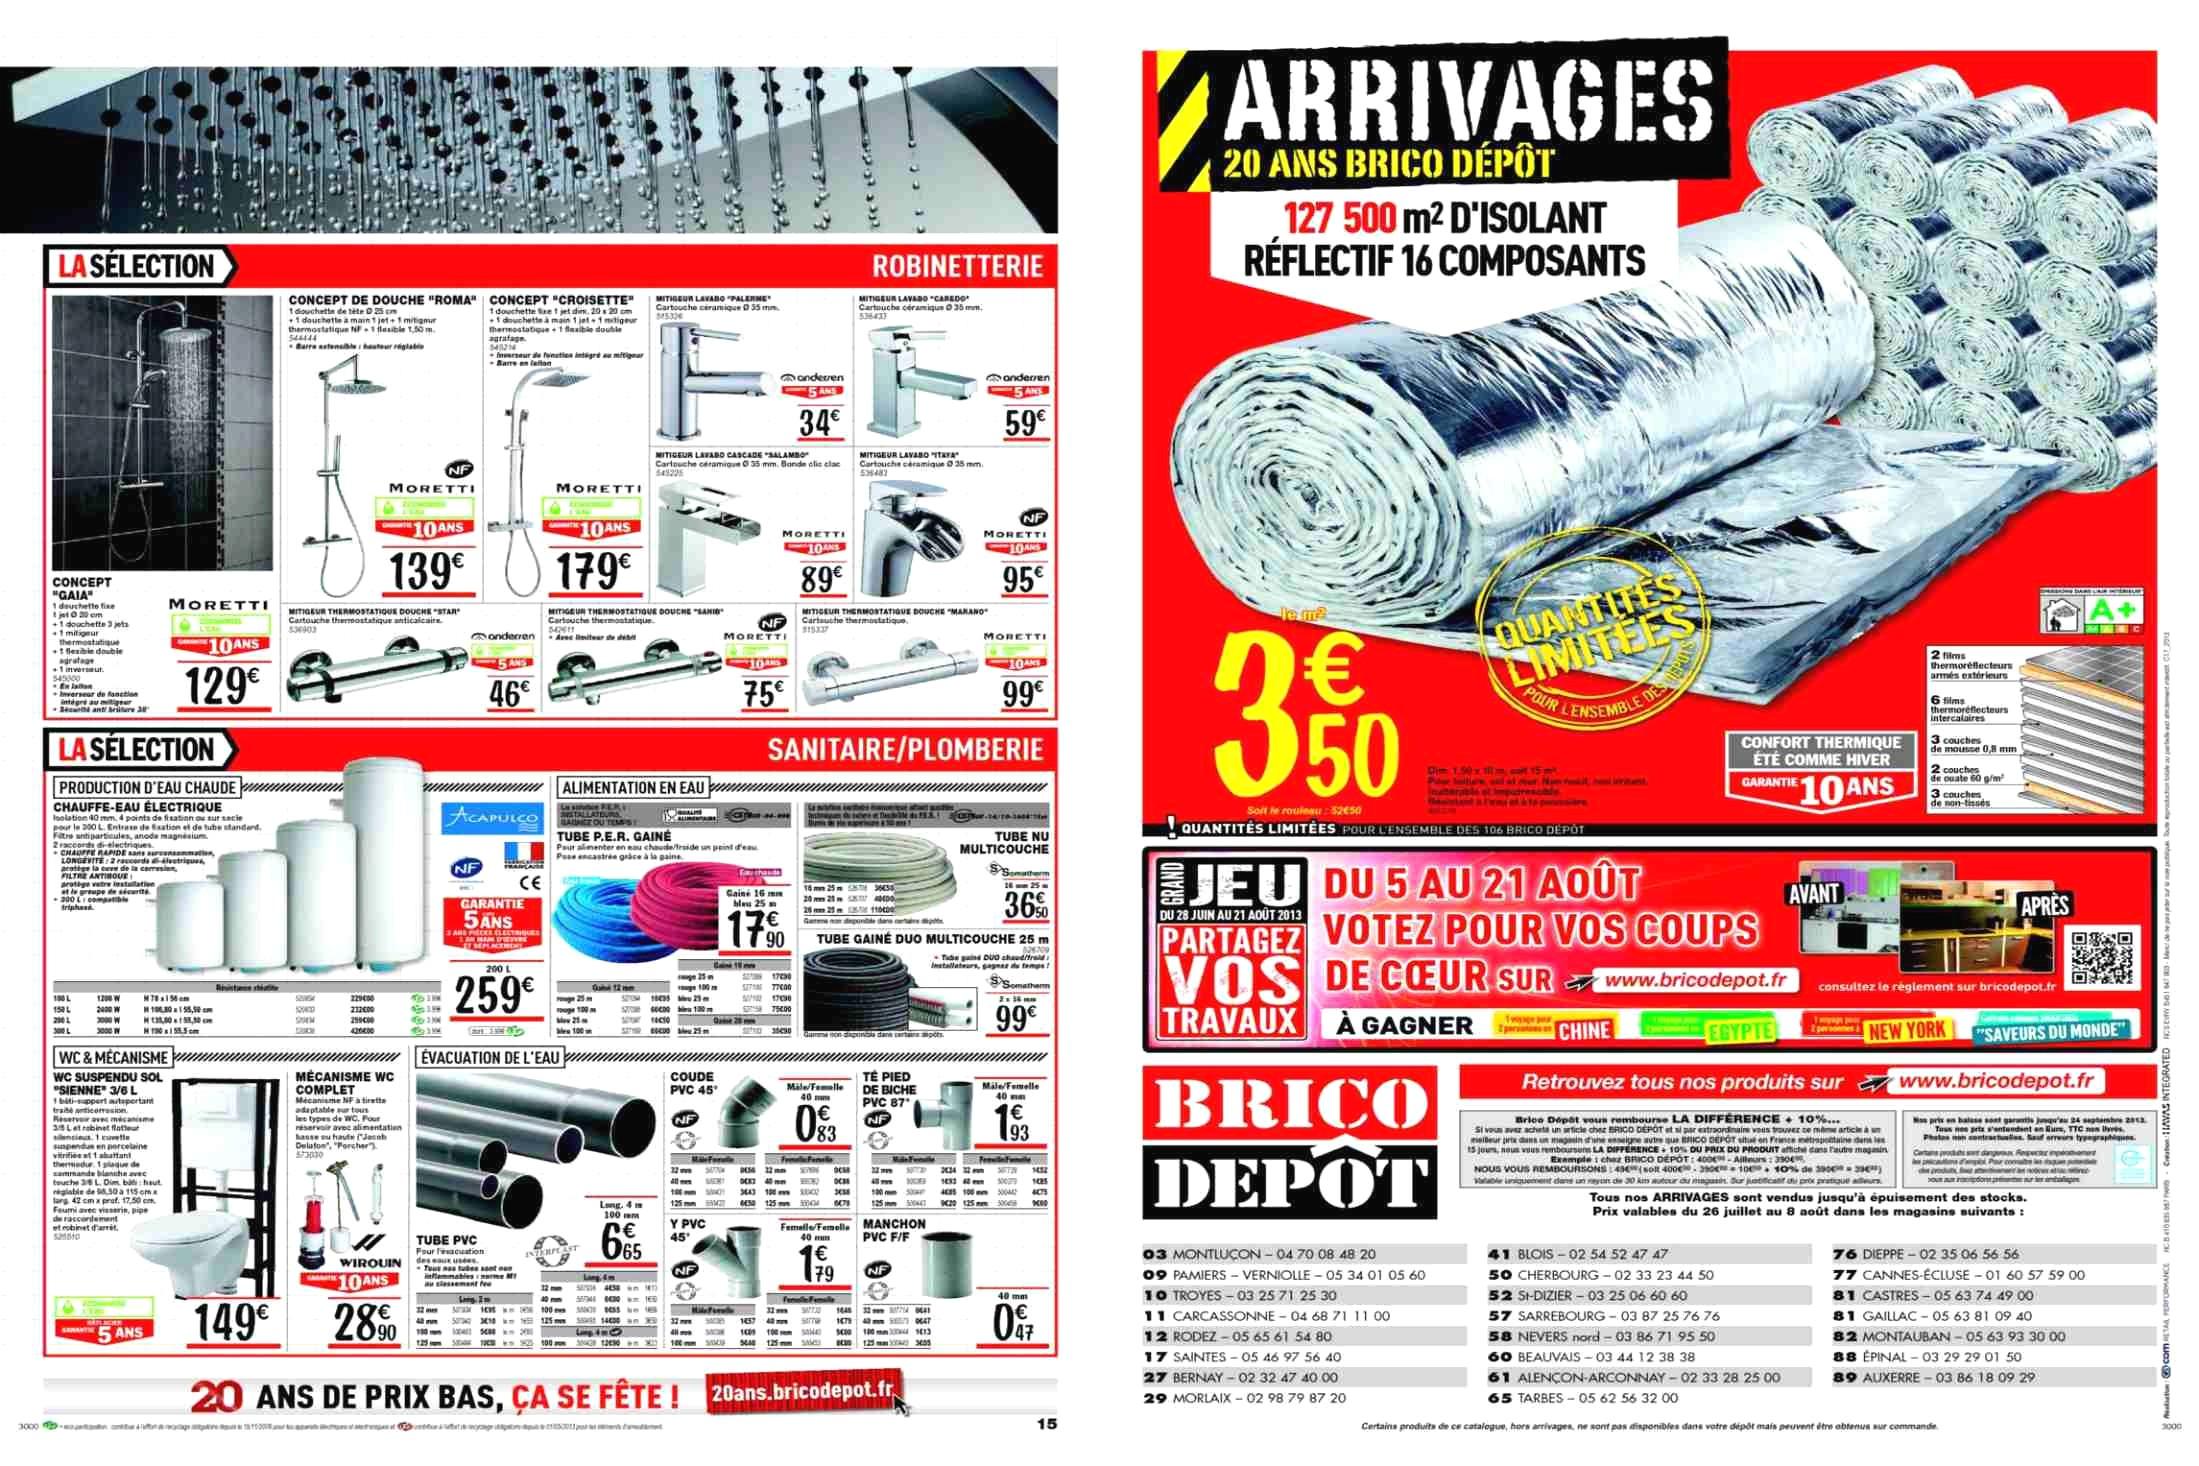 cuisine plete brico depot bigbi info avec 8 et brico depot catalogue 32 2199x1466px brico depot catalogue